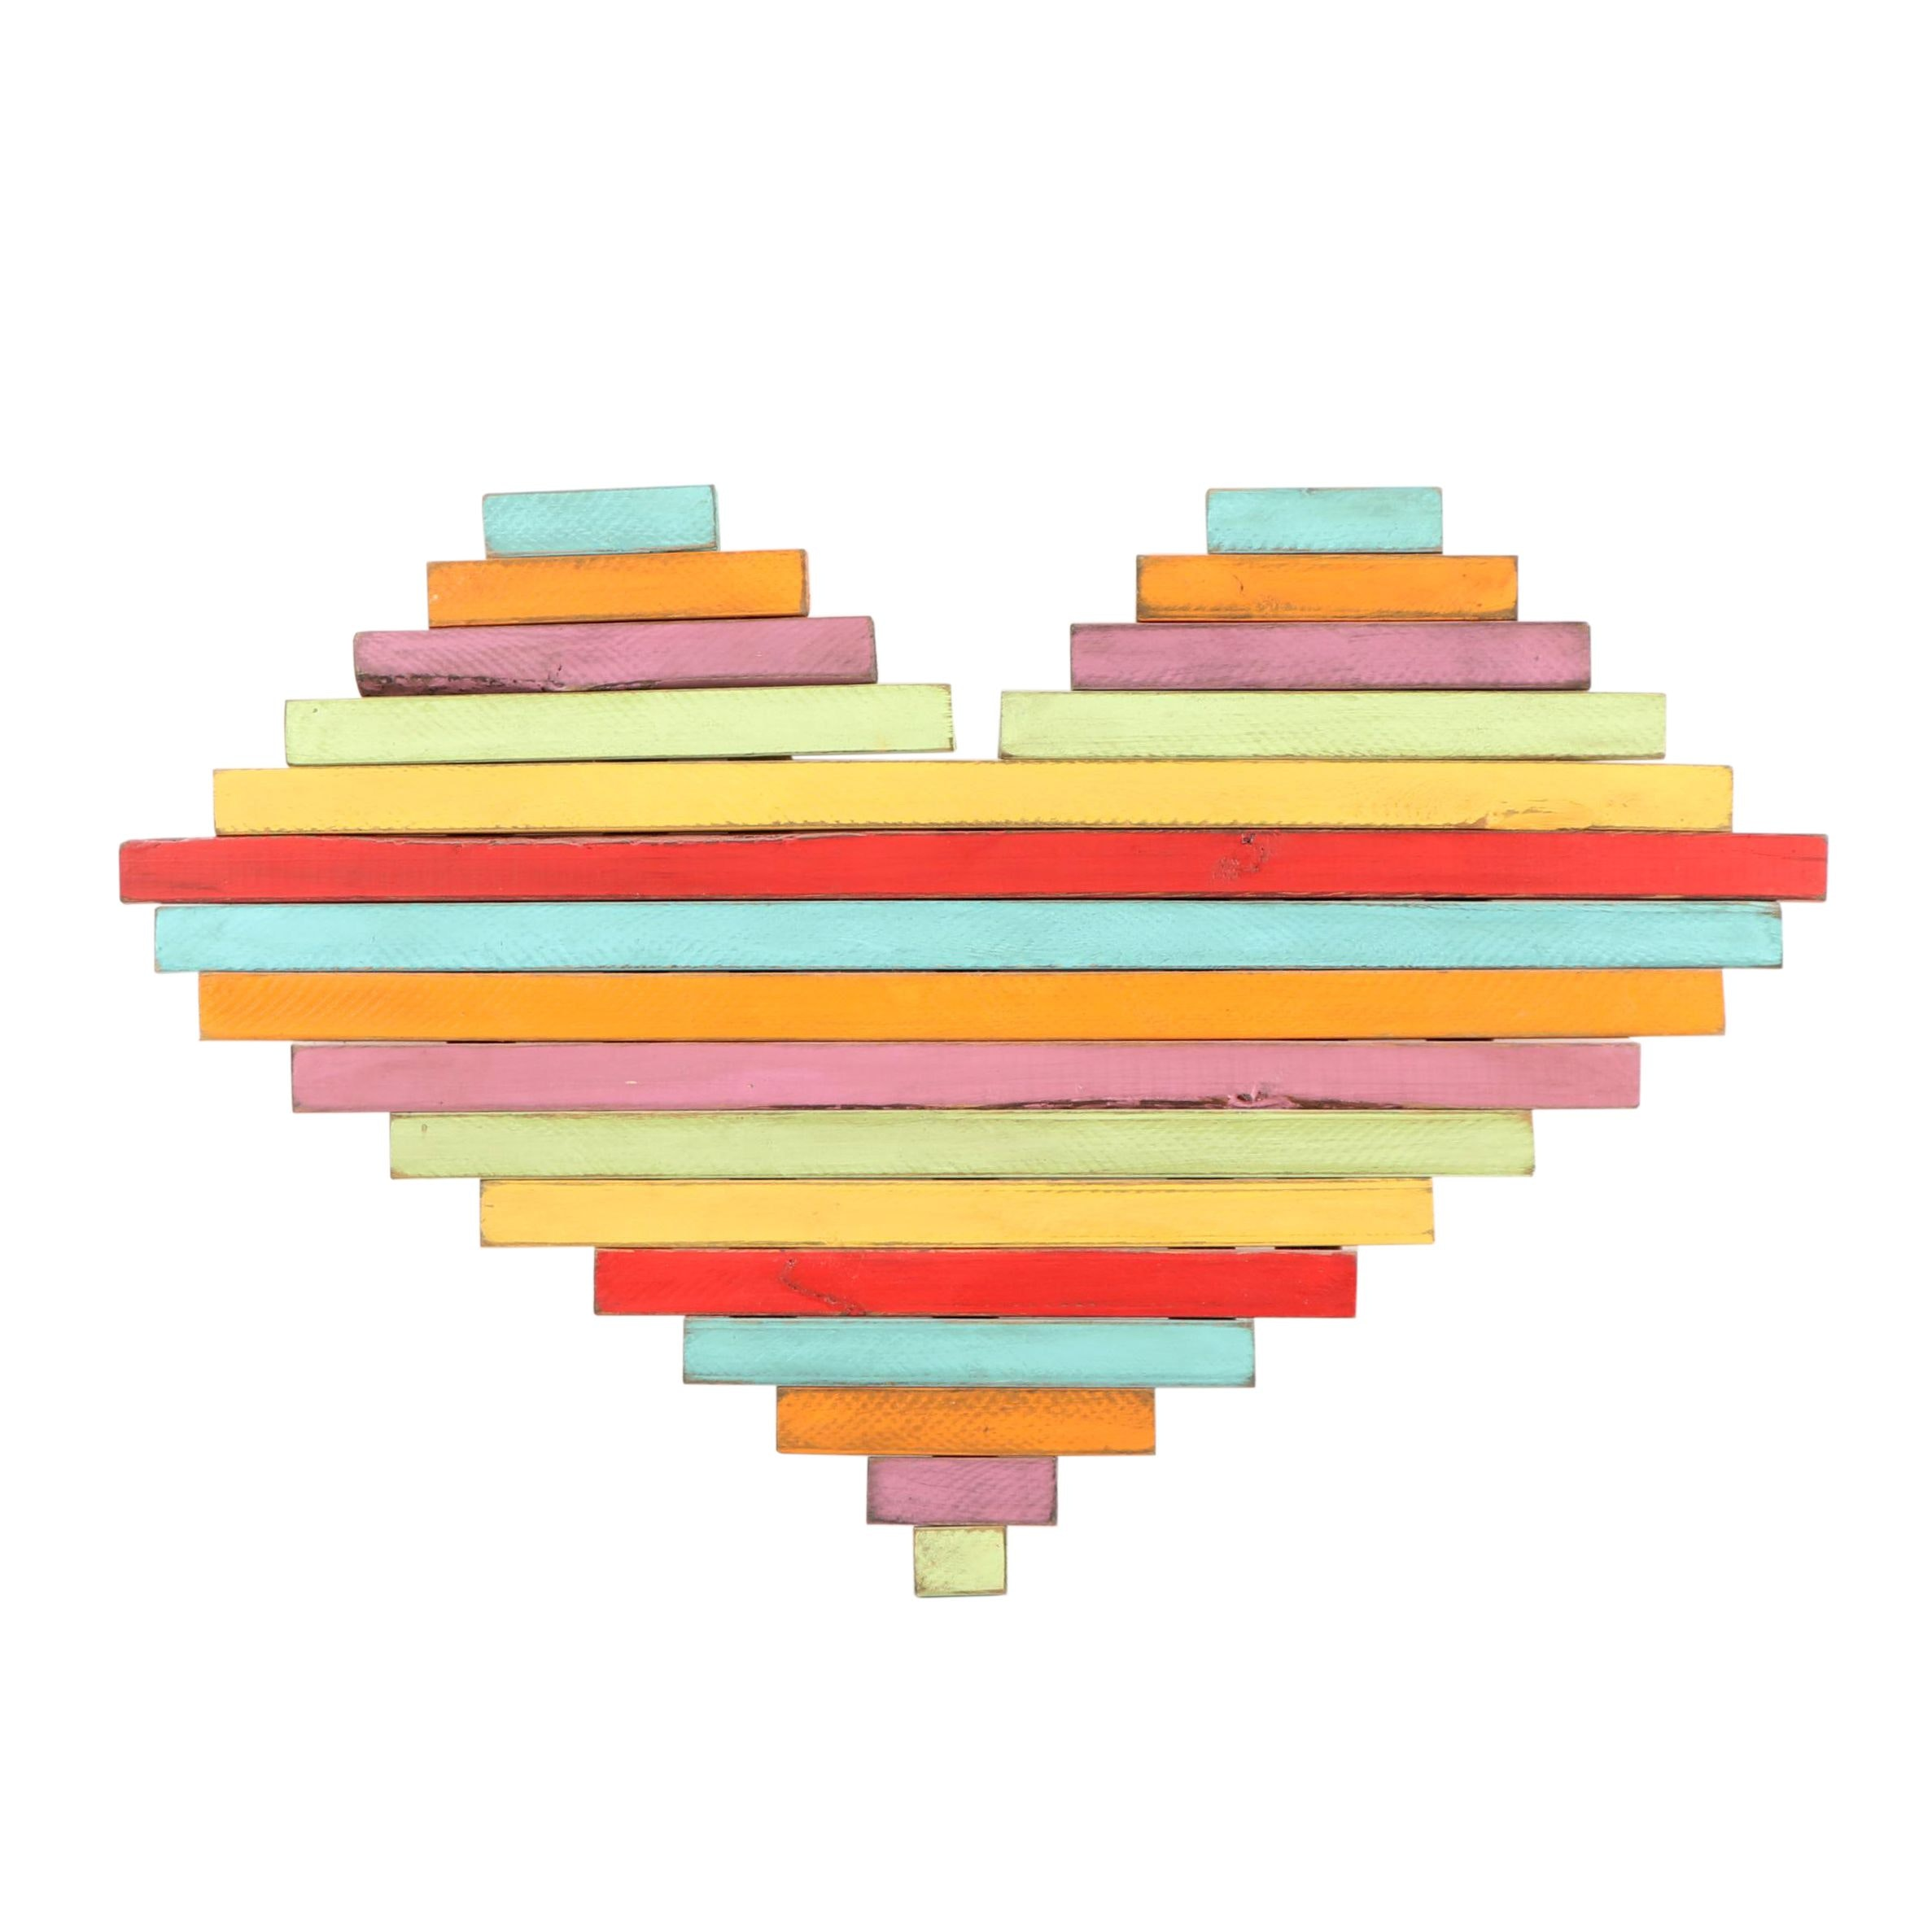 Lisa Steele Up-Cycled Wood Heart Painting